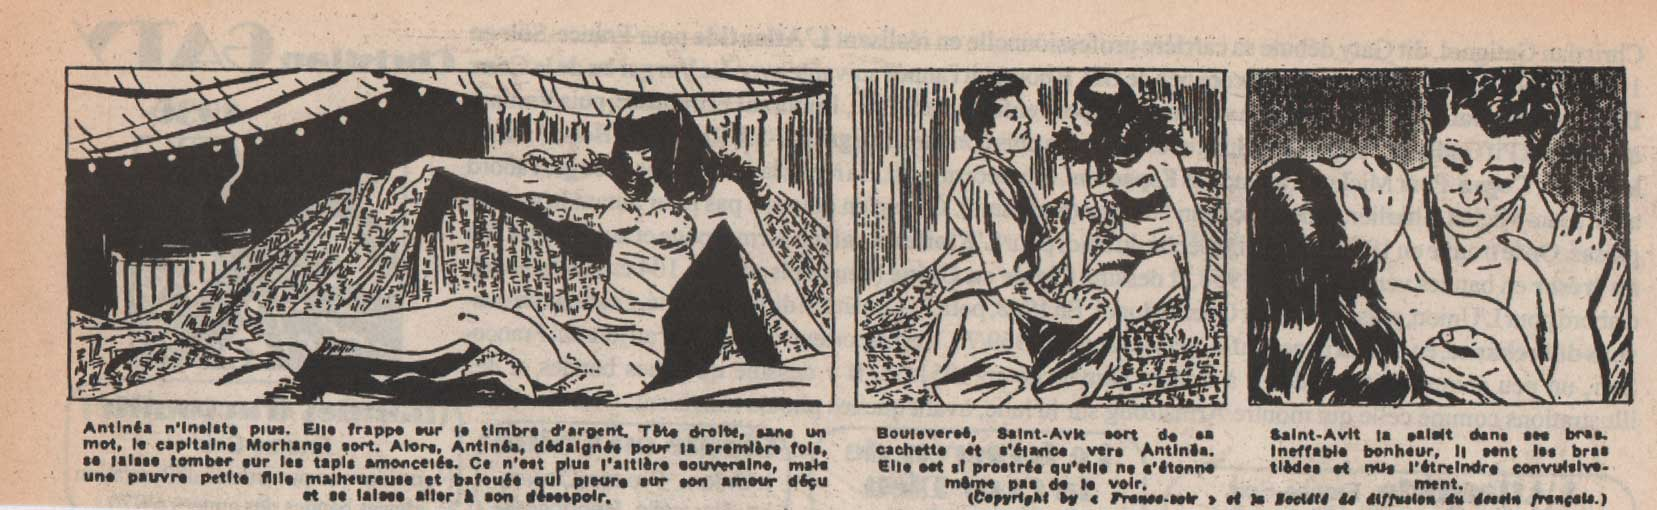 « L'Atlantide » S.D.D.F. (1949).